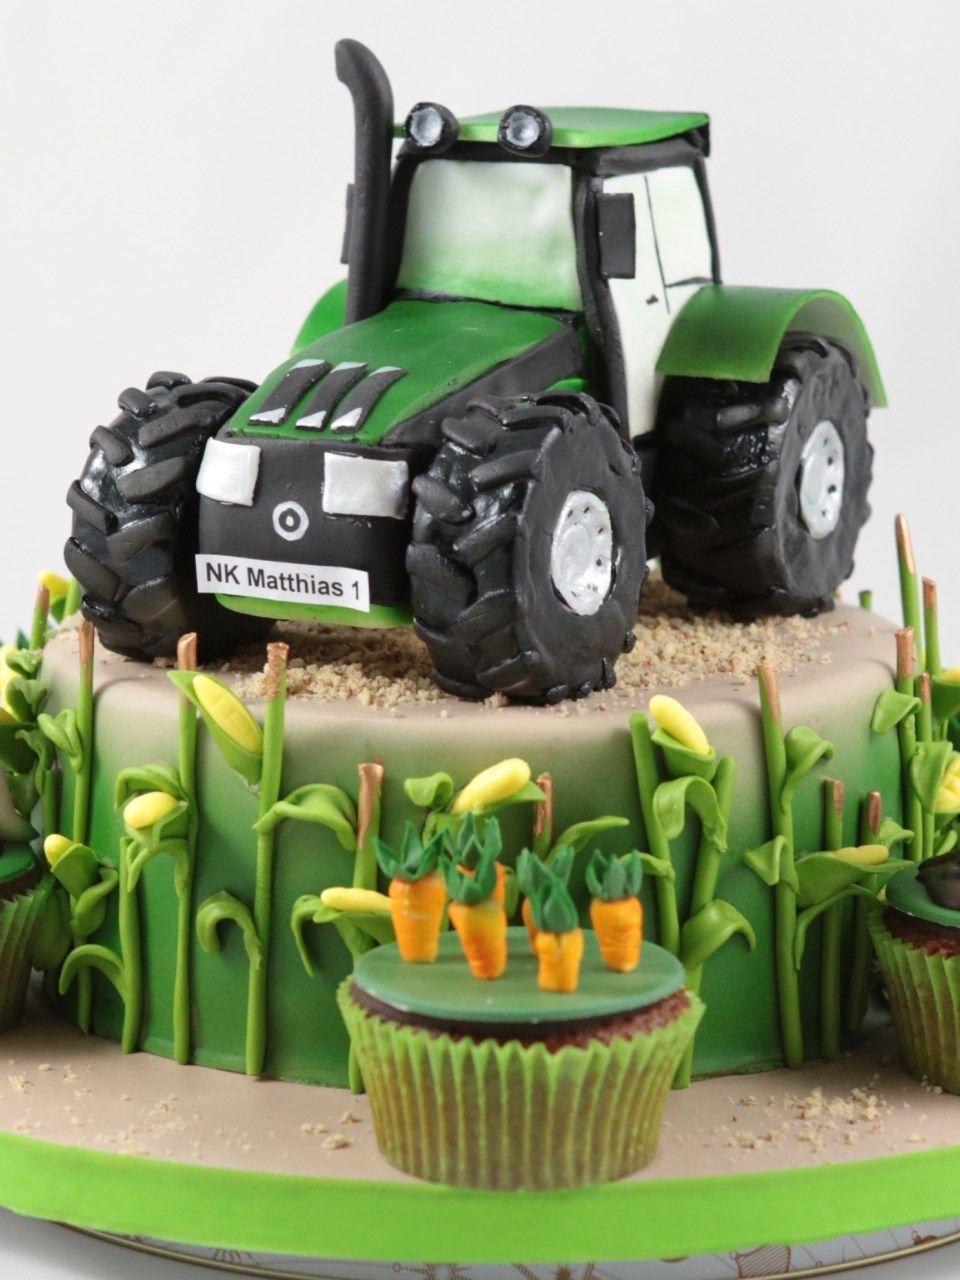 Tractor Cake Traktor Torte Caketopper Bauernhof Traktor Torte Traktor Kuchen Bauernhoftorte